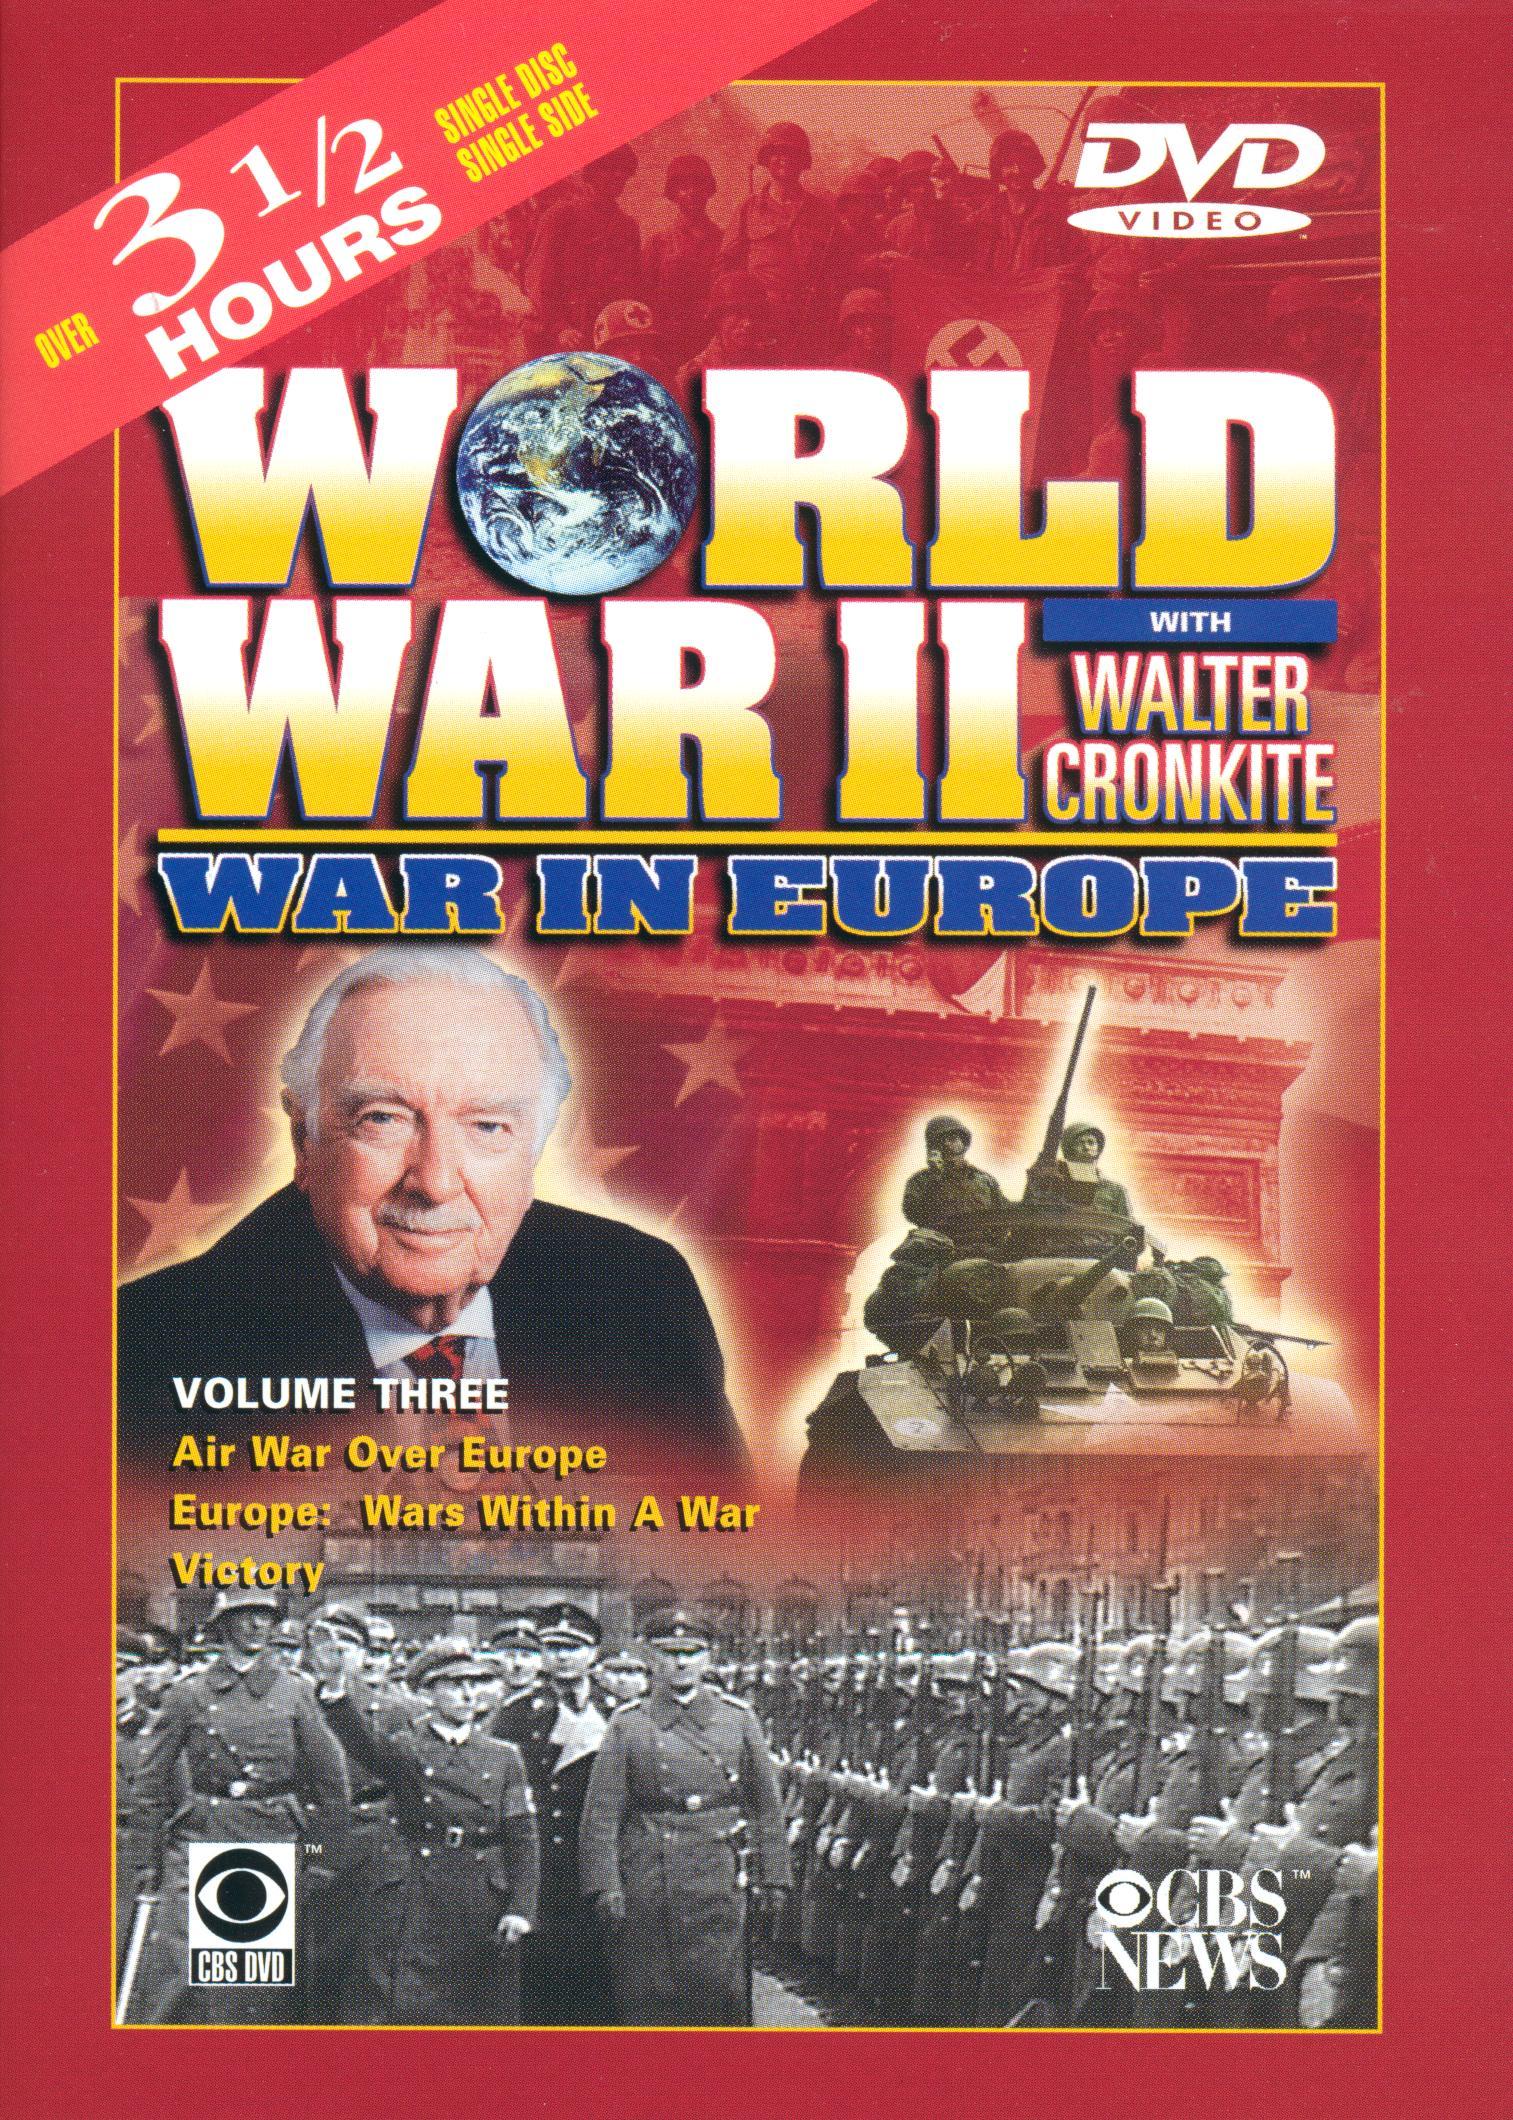 World War II With Walter Cronkite: War in Europe, Vol. 3